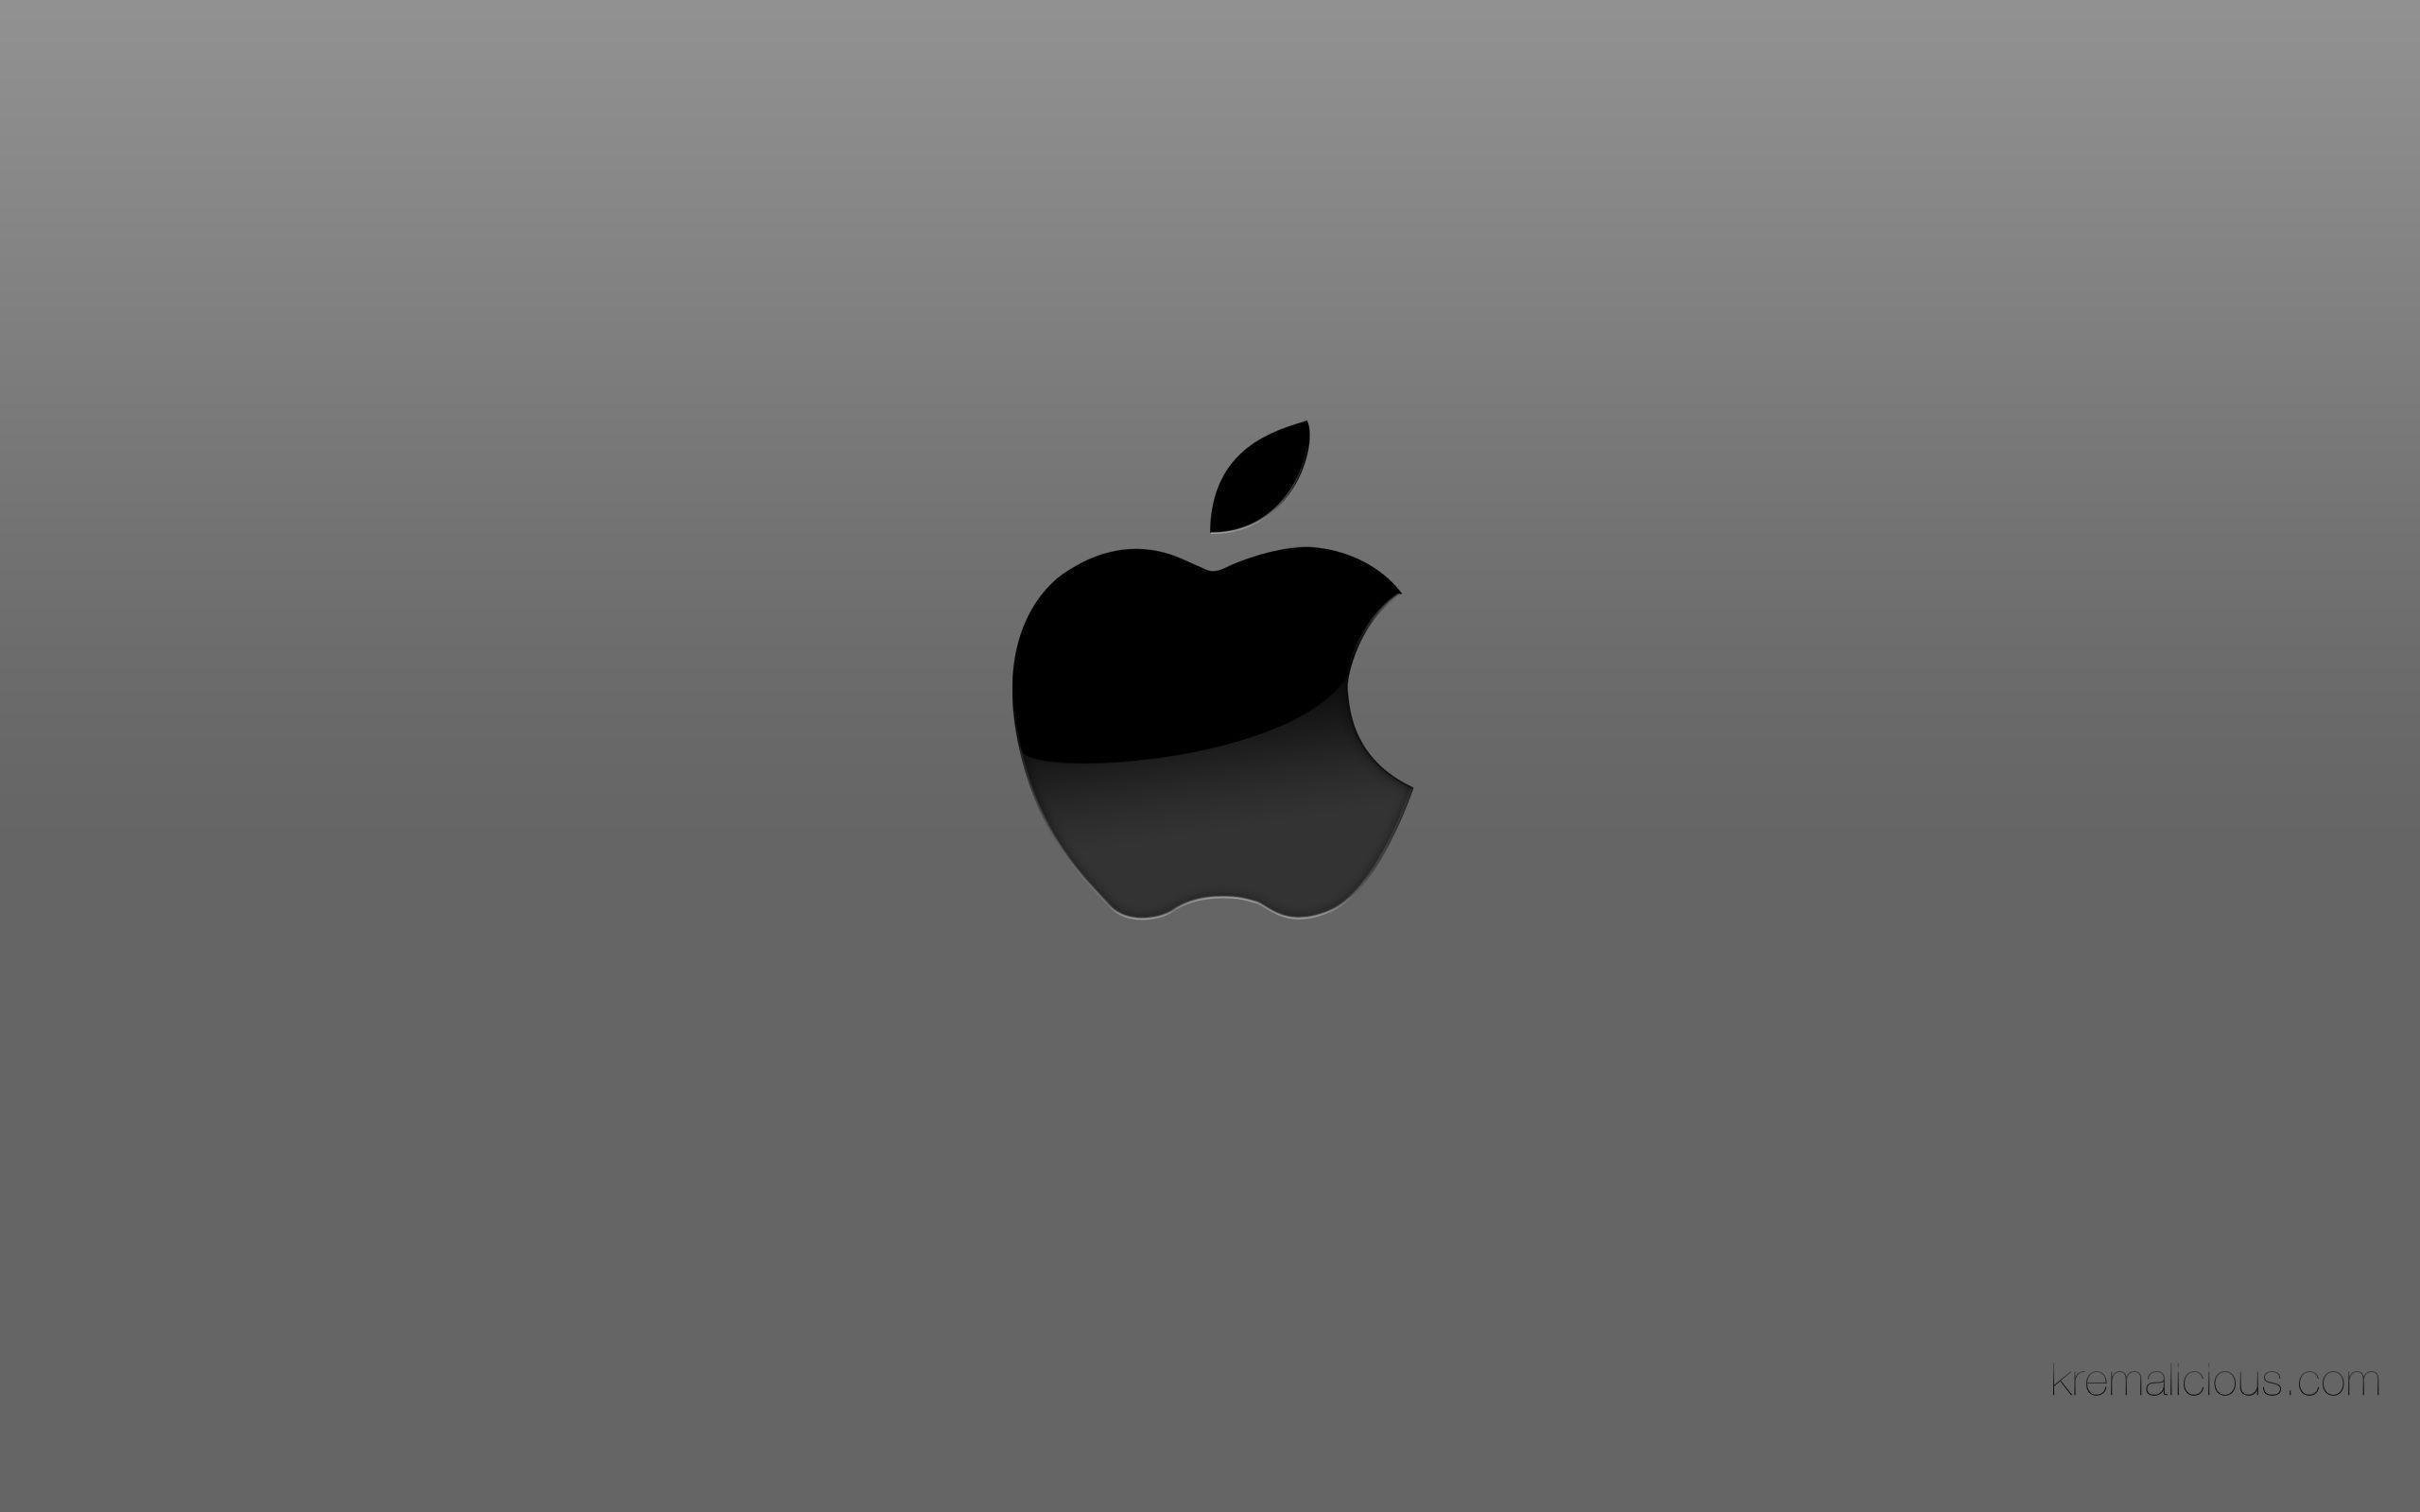 Apple Logo Hd Wallpaper Wallpapertag